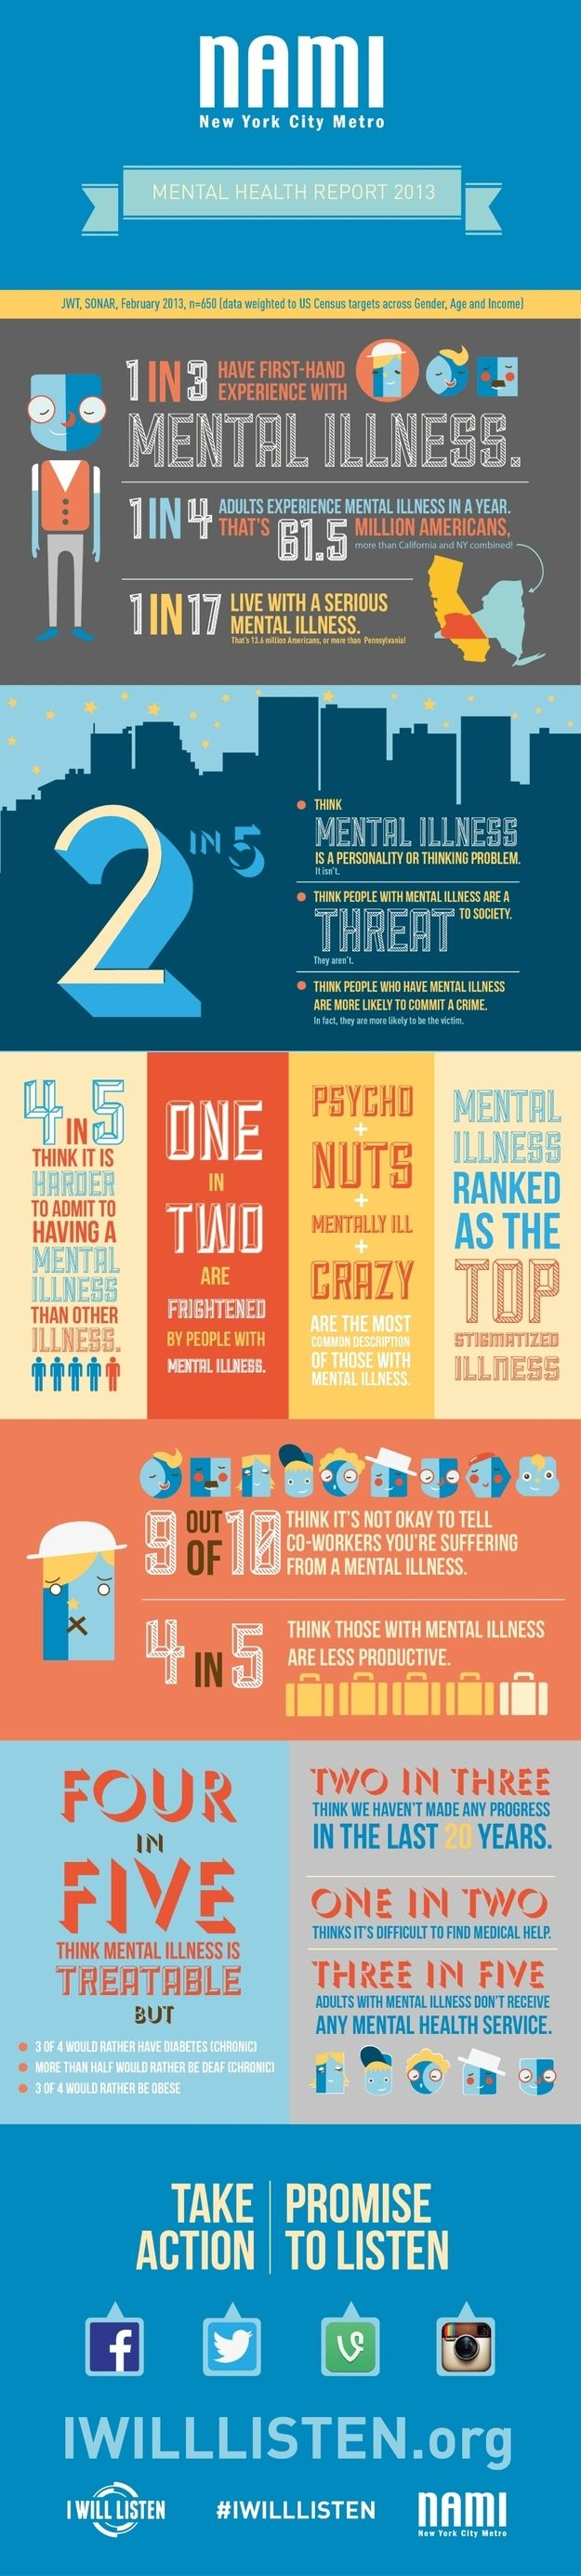 World Mental Health Day Oct 10th